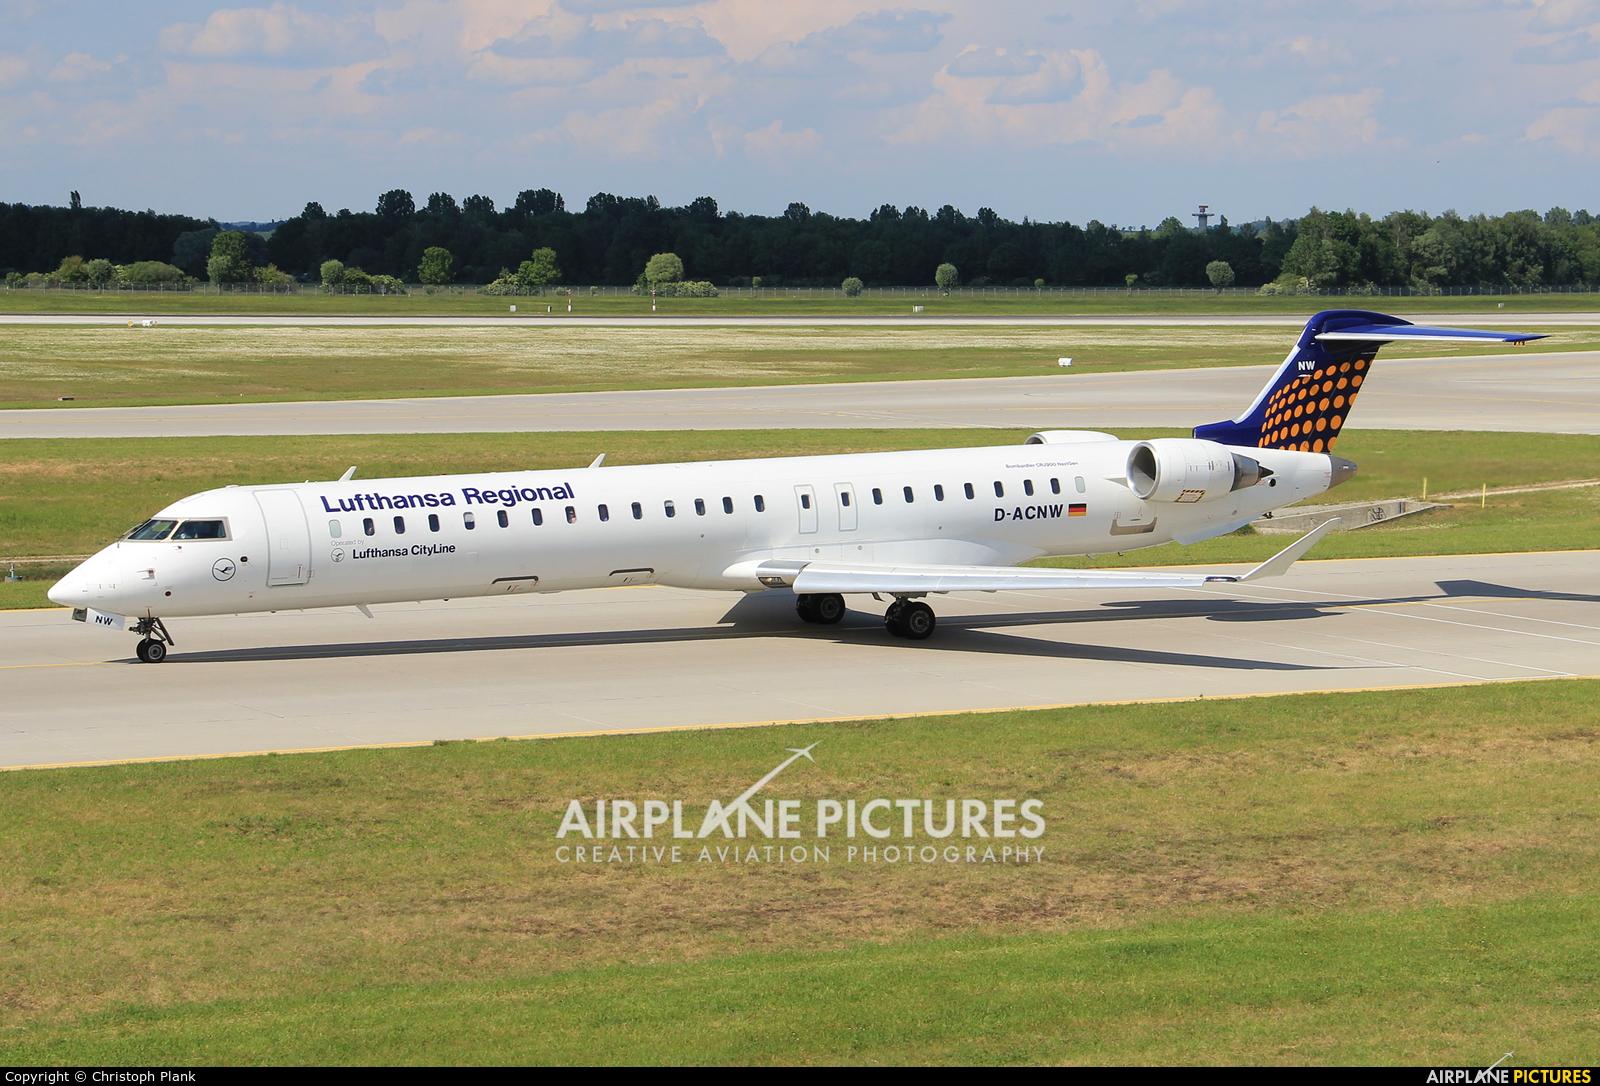 Lufthansa Regional - CityLine D-ACNW aircraft at Munich